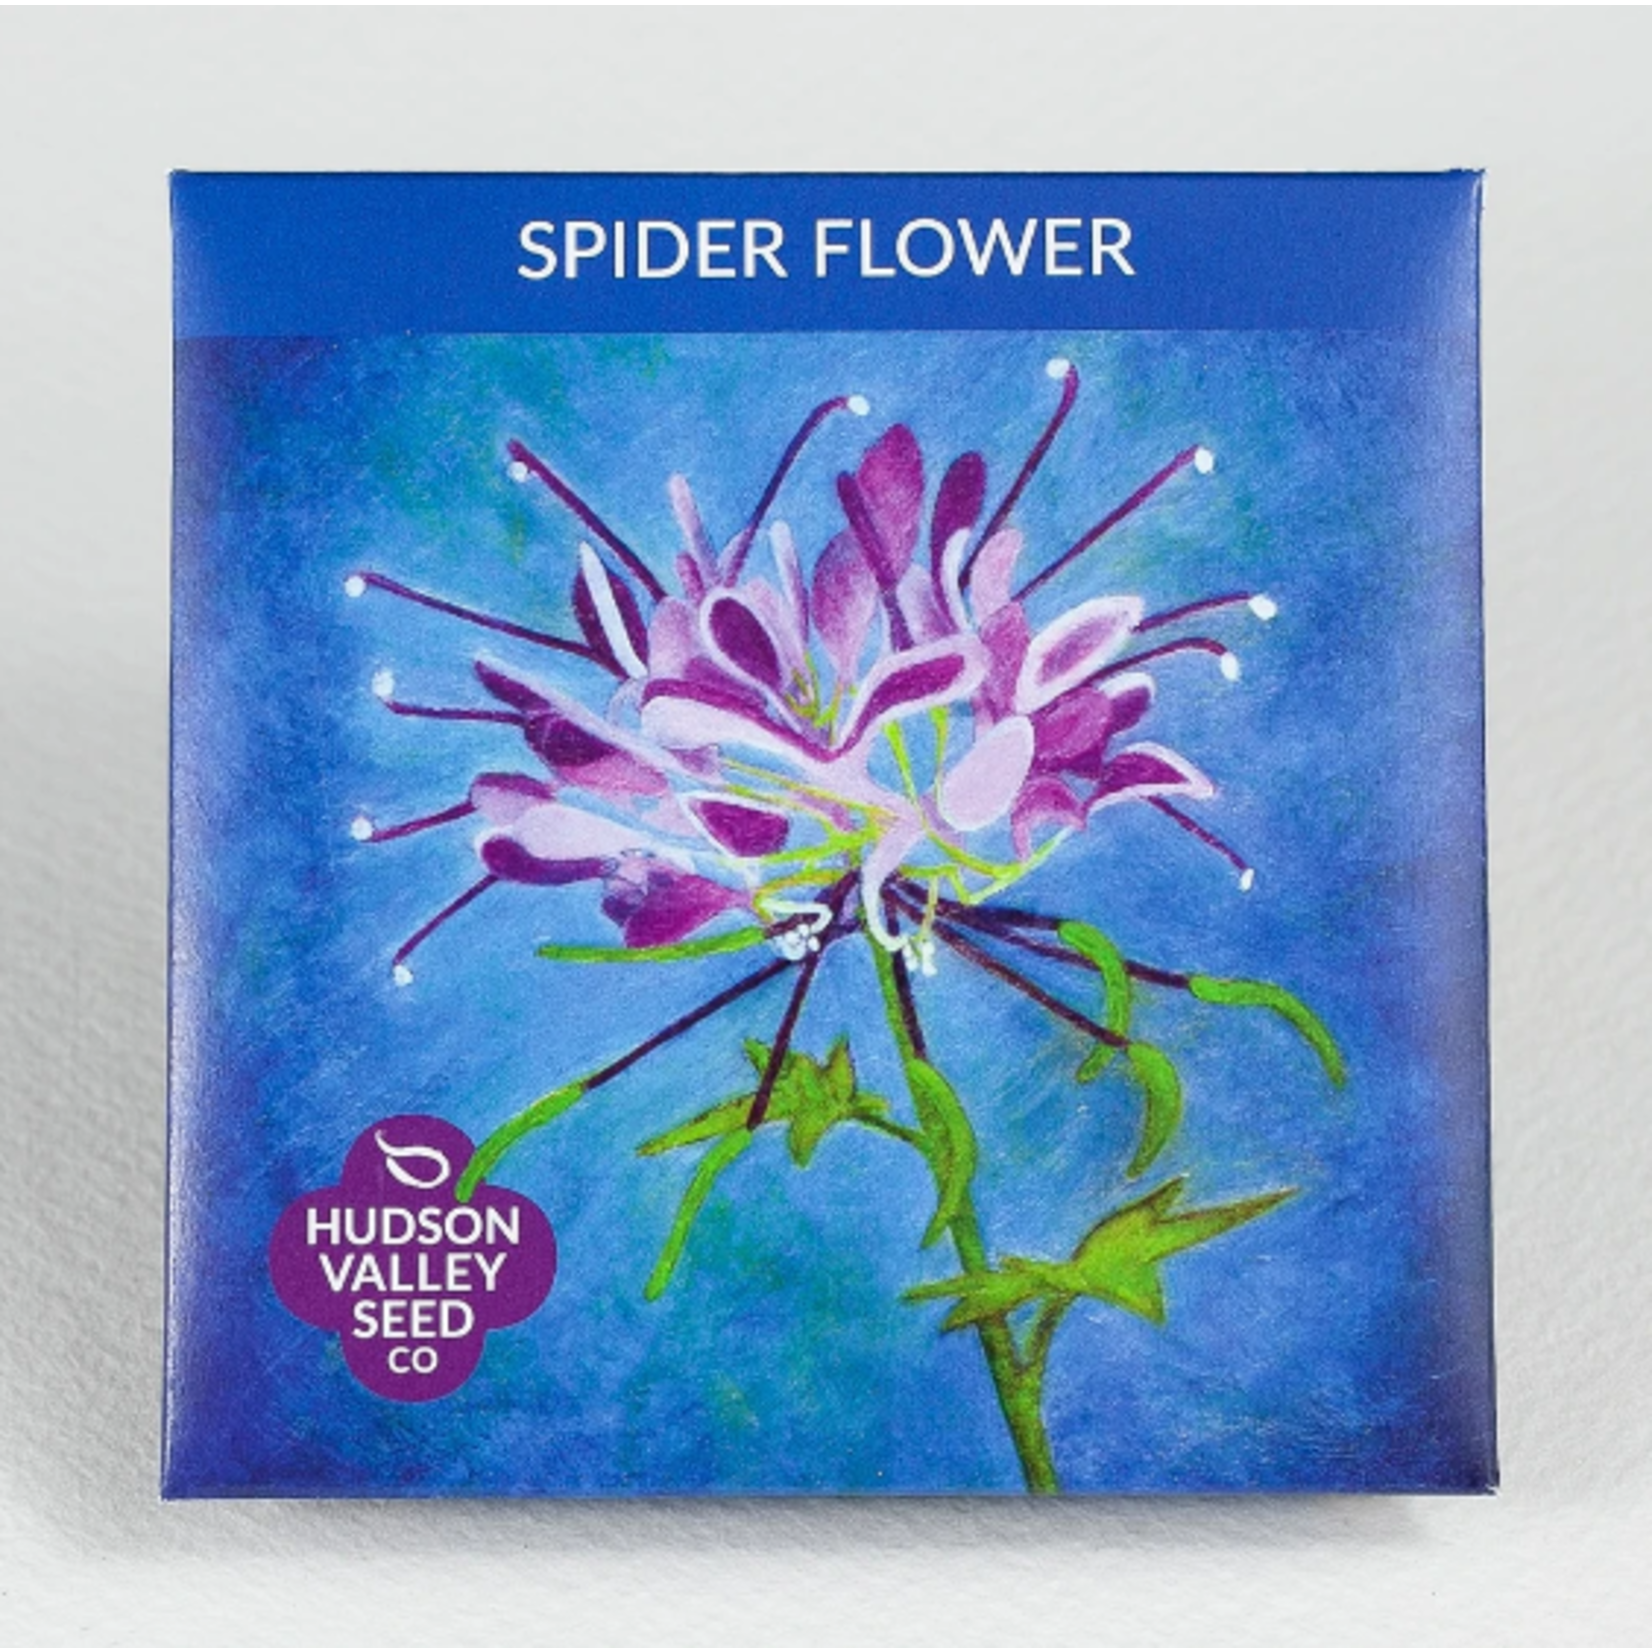 Hudson Valley Seeds Spider Flower Seeds